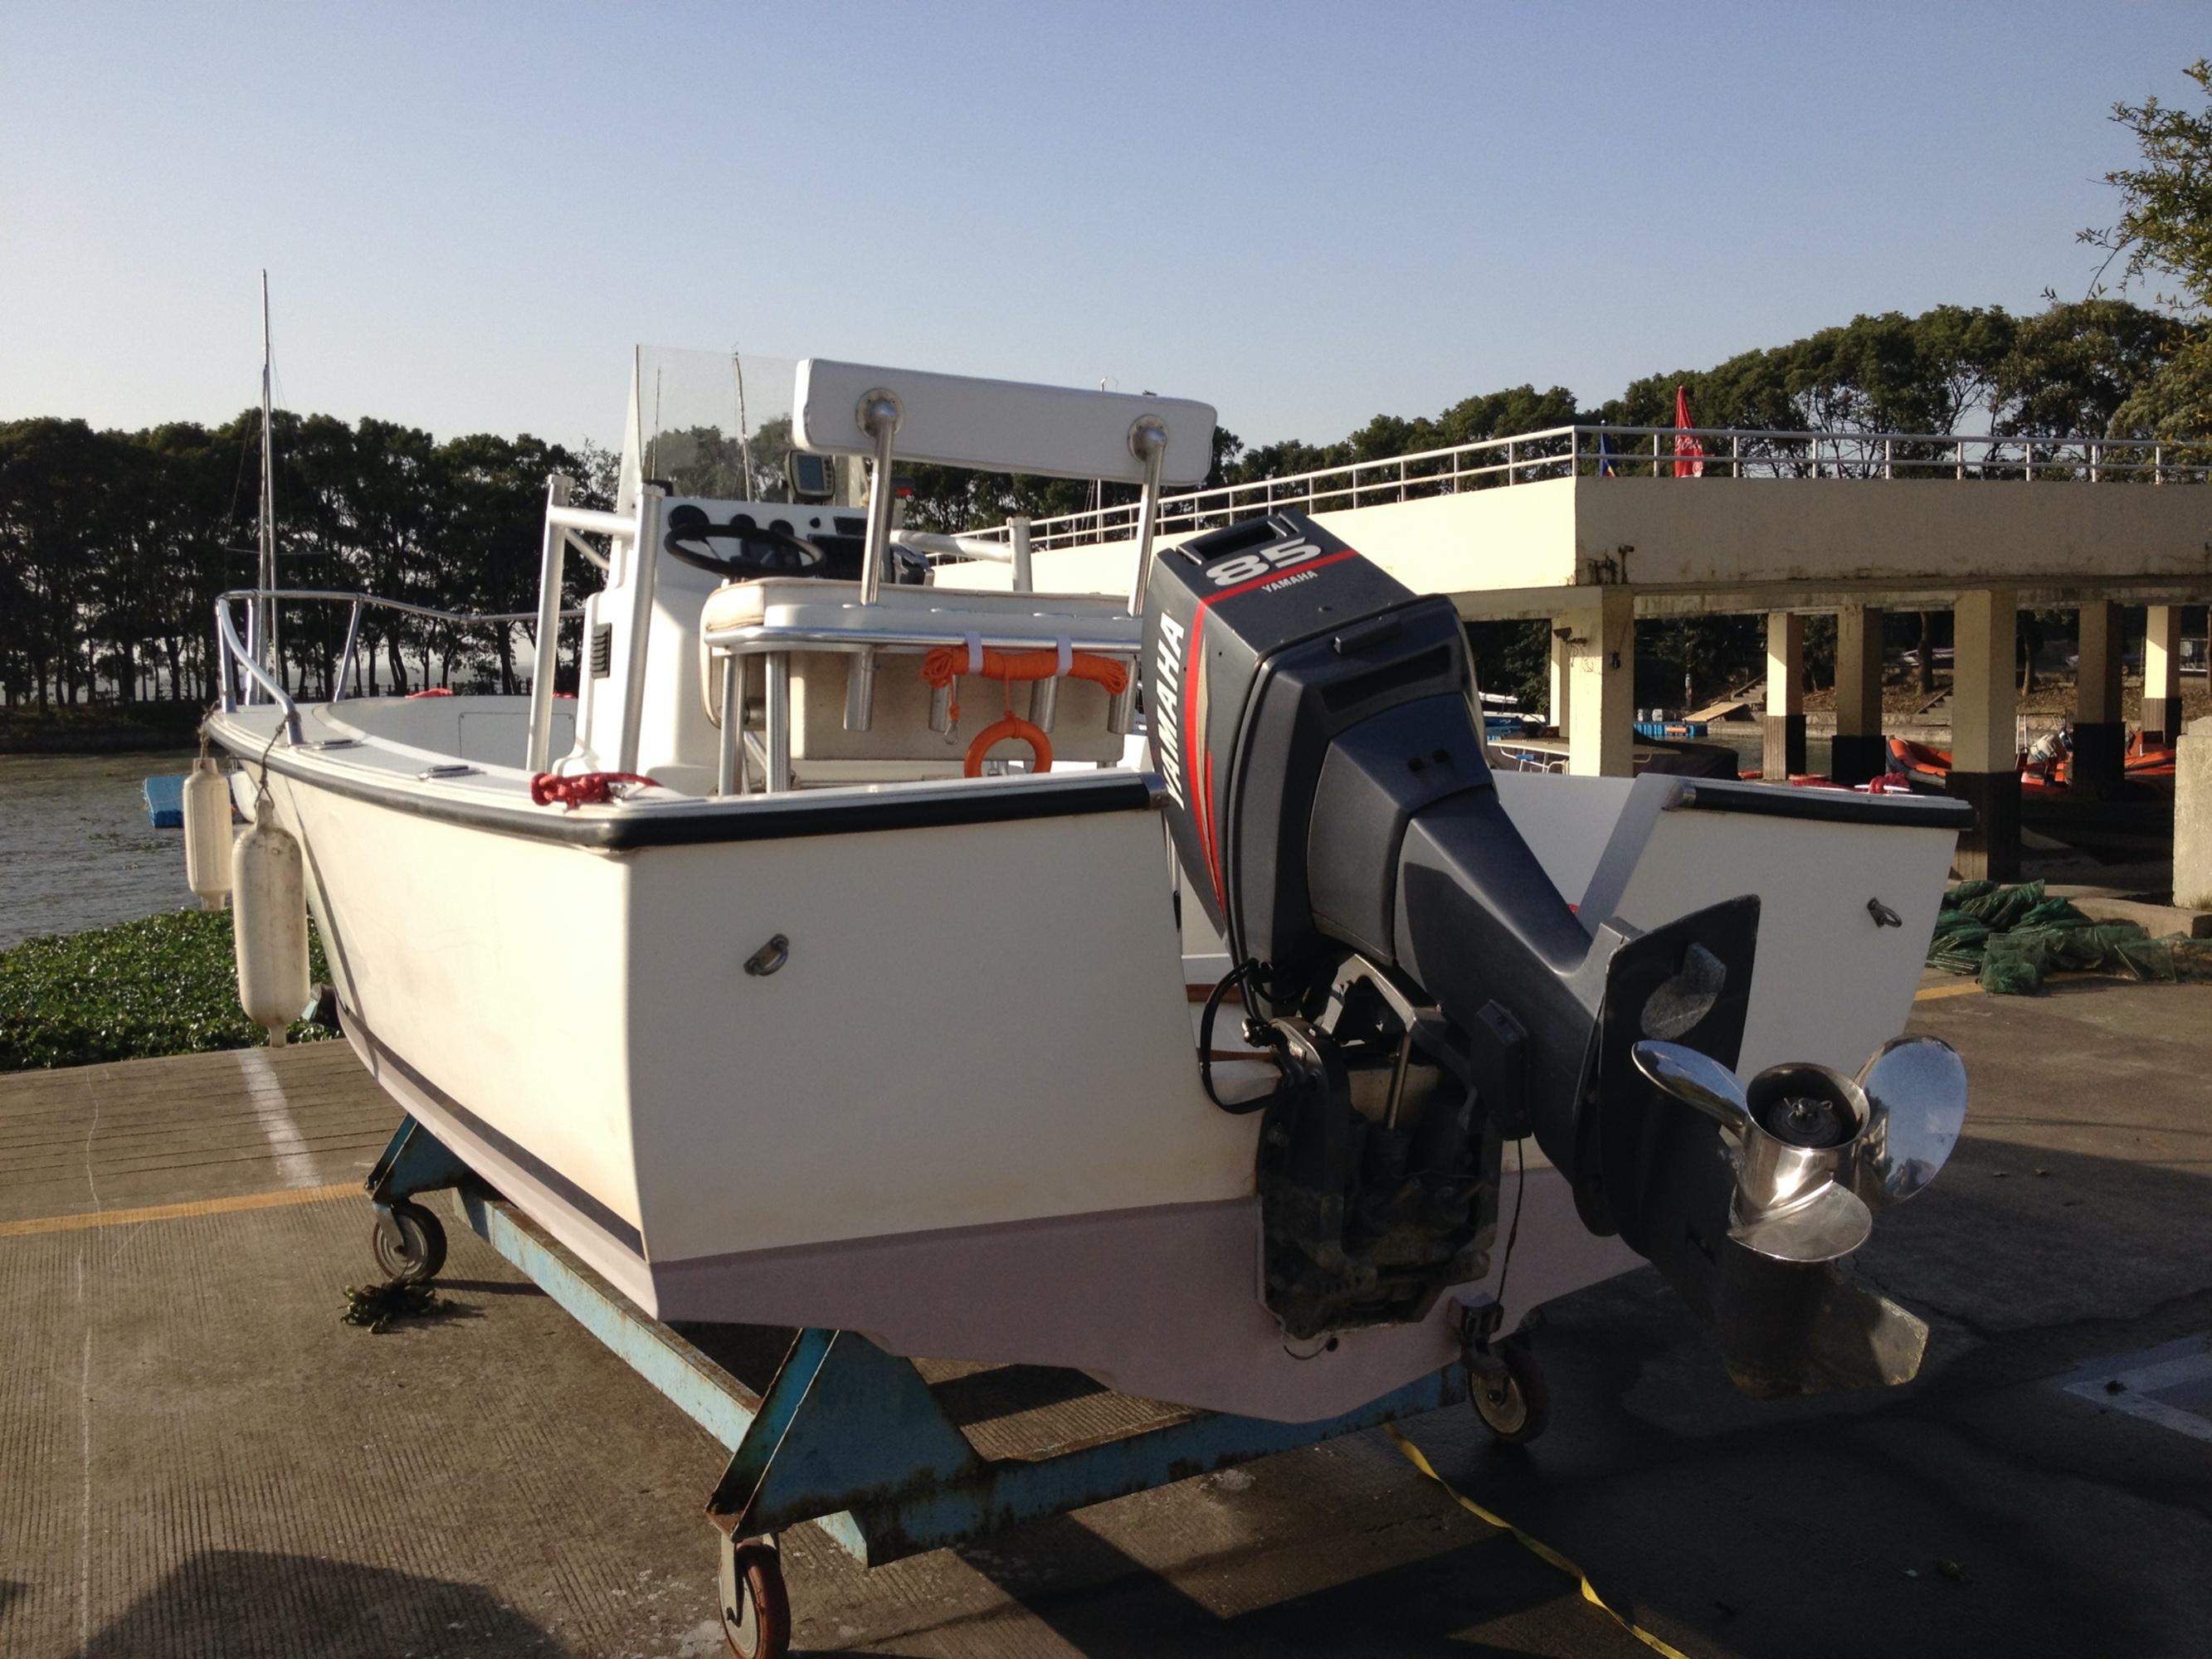 nbsp,设备,Heritage,雅马哈,保养 美国Heritage钓鱼艇  4.9万元 (证书待办中)